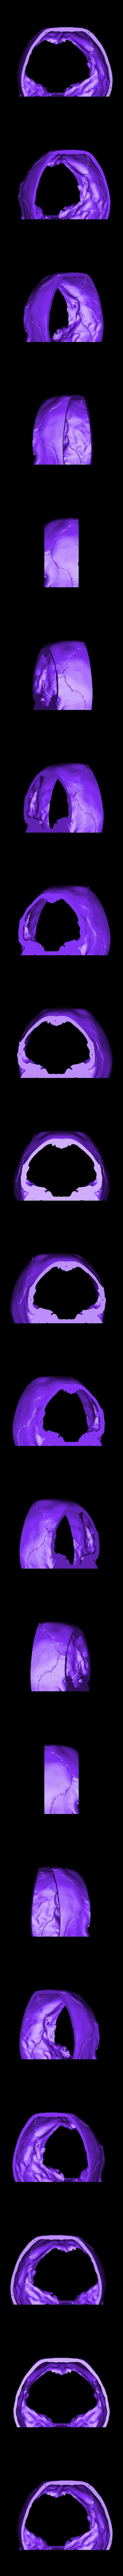 skull-mid-back.stl Download free STL file Human skull, anatomically correct - for smaller printers • 3D printer template, firebird